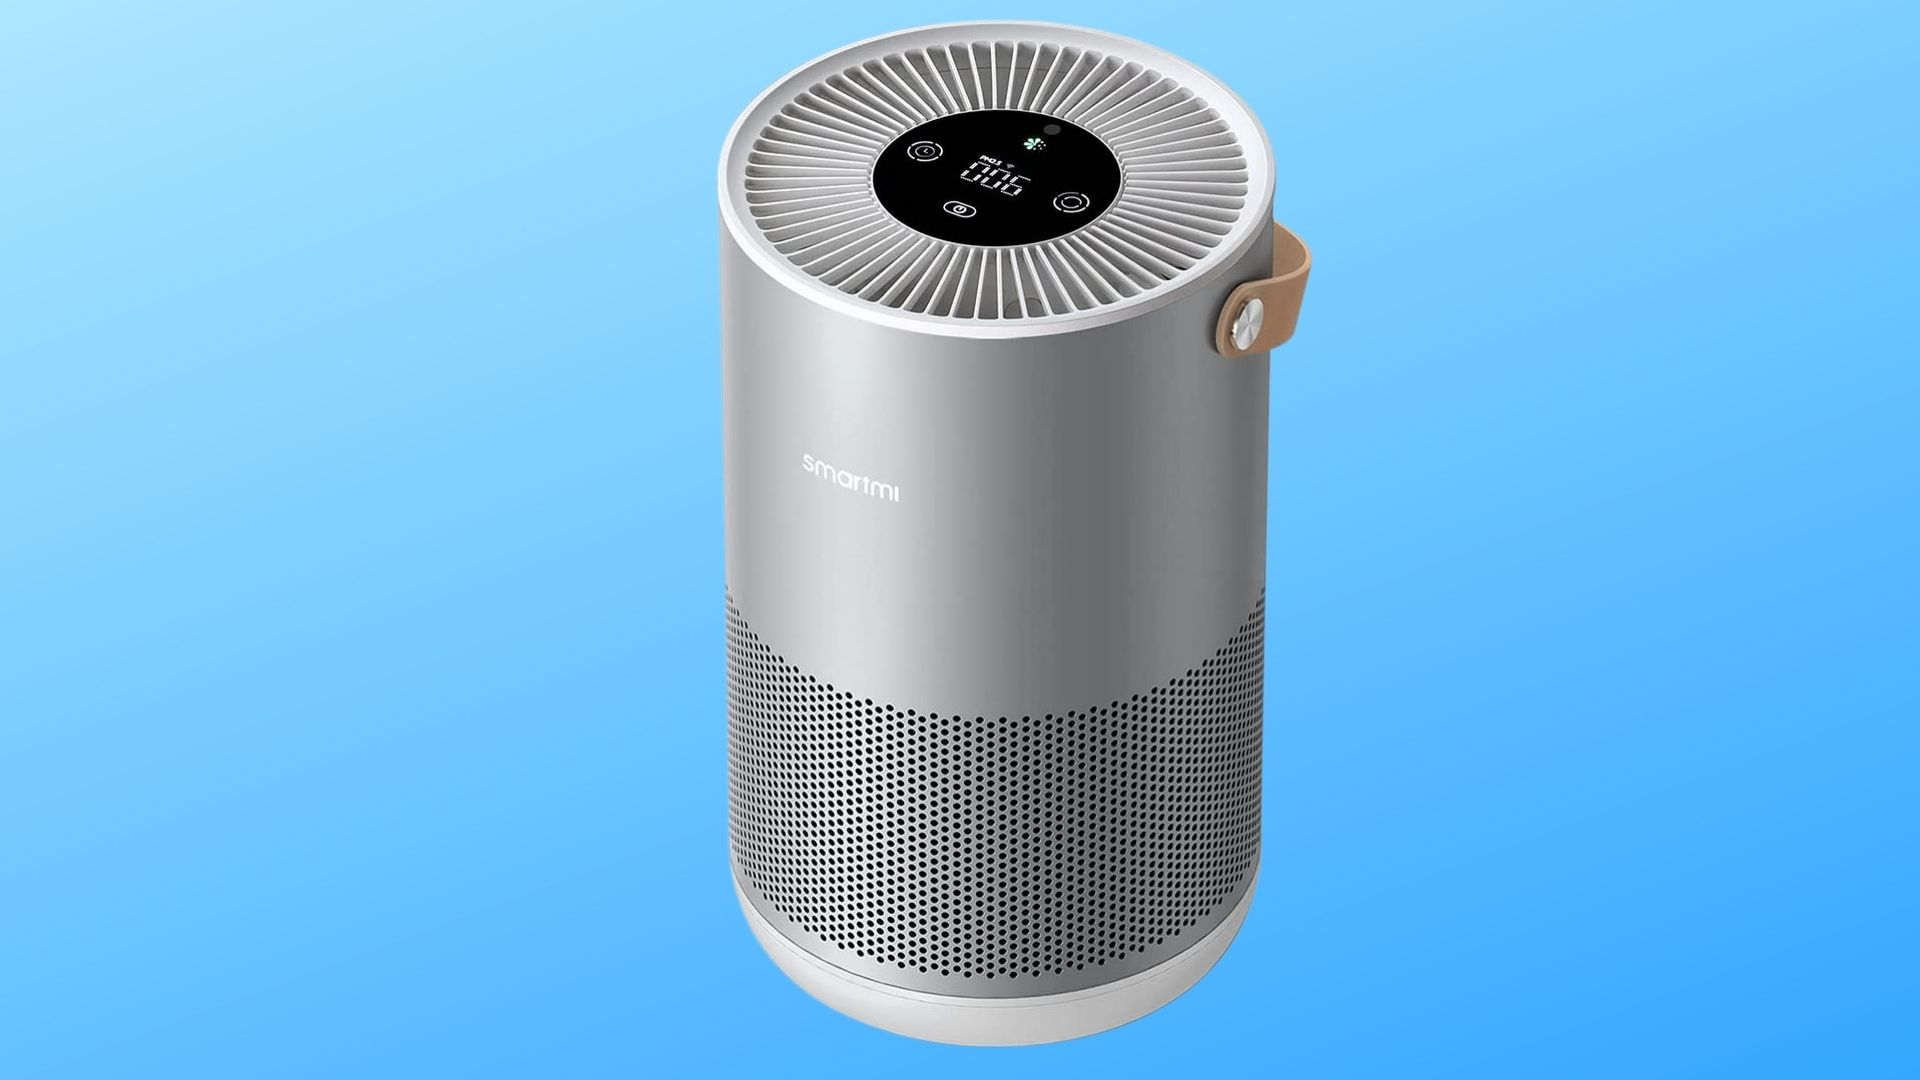 smartmi best air purifier for viruses